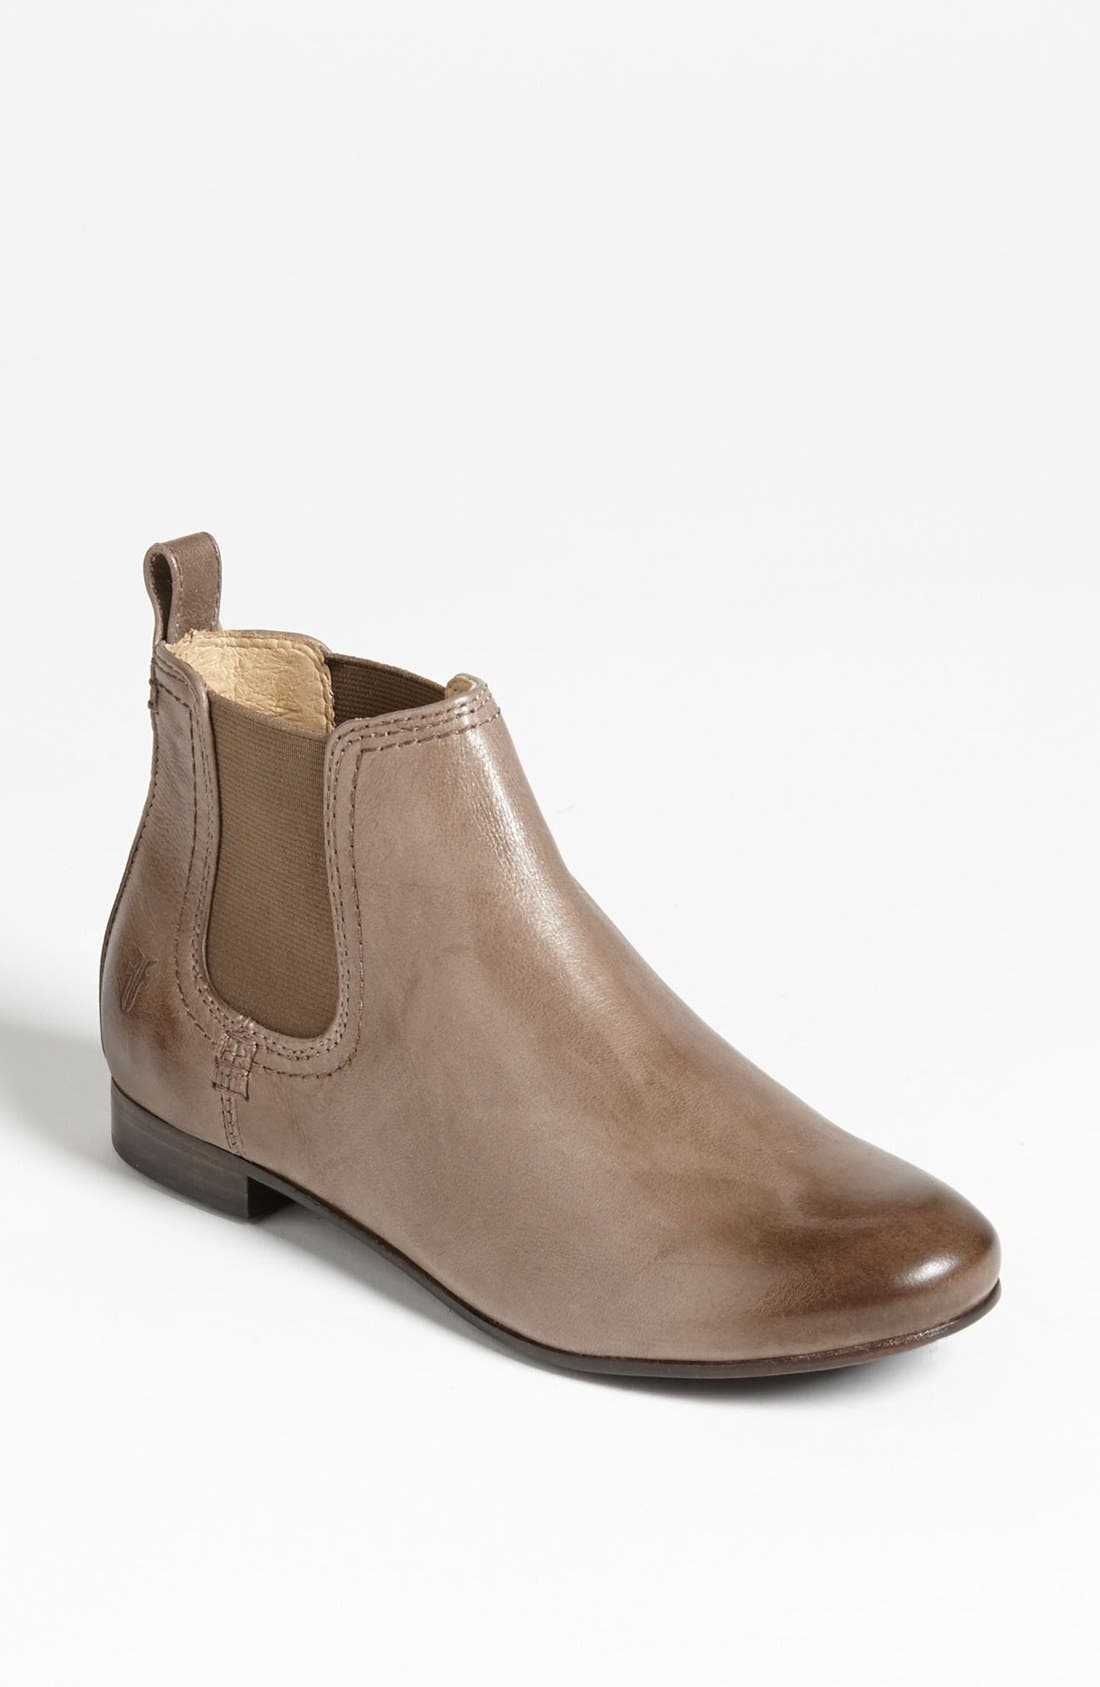 Main Image - Frye 'Jillian' Chelsea Boot